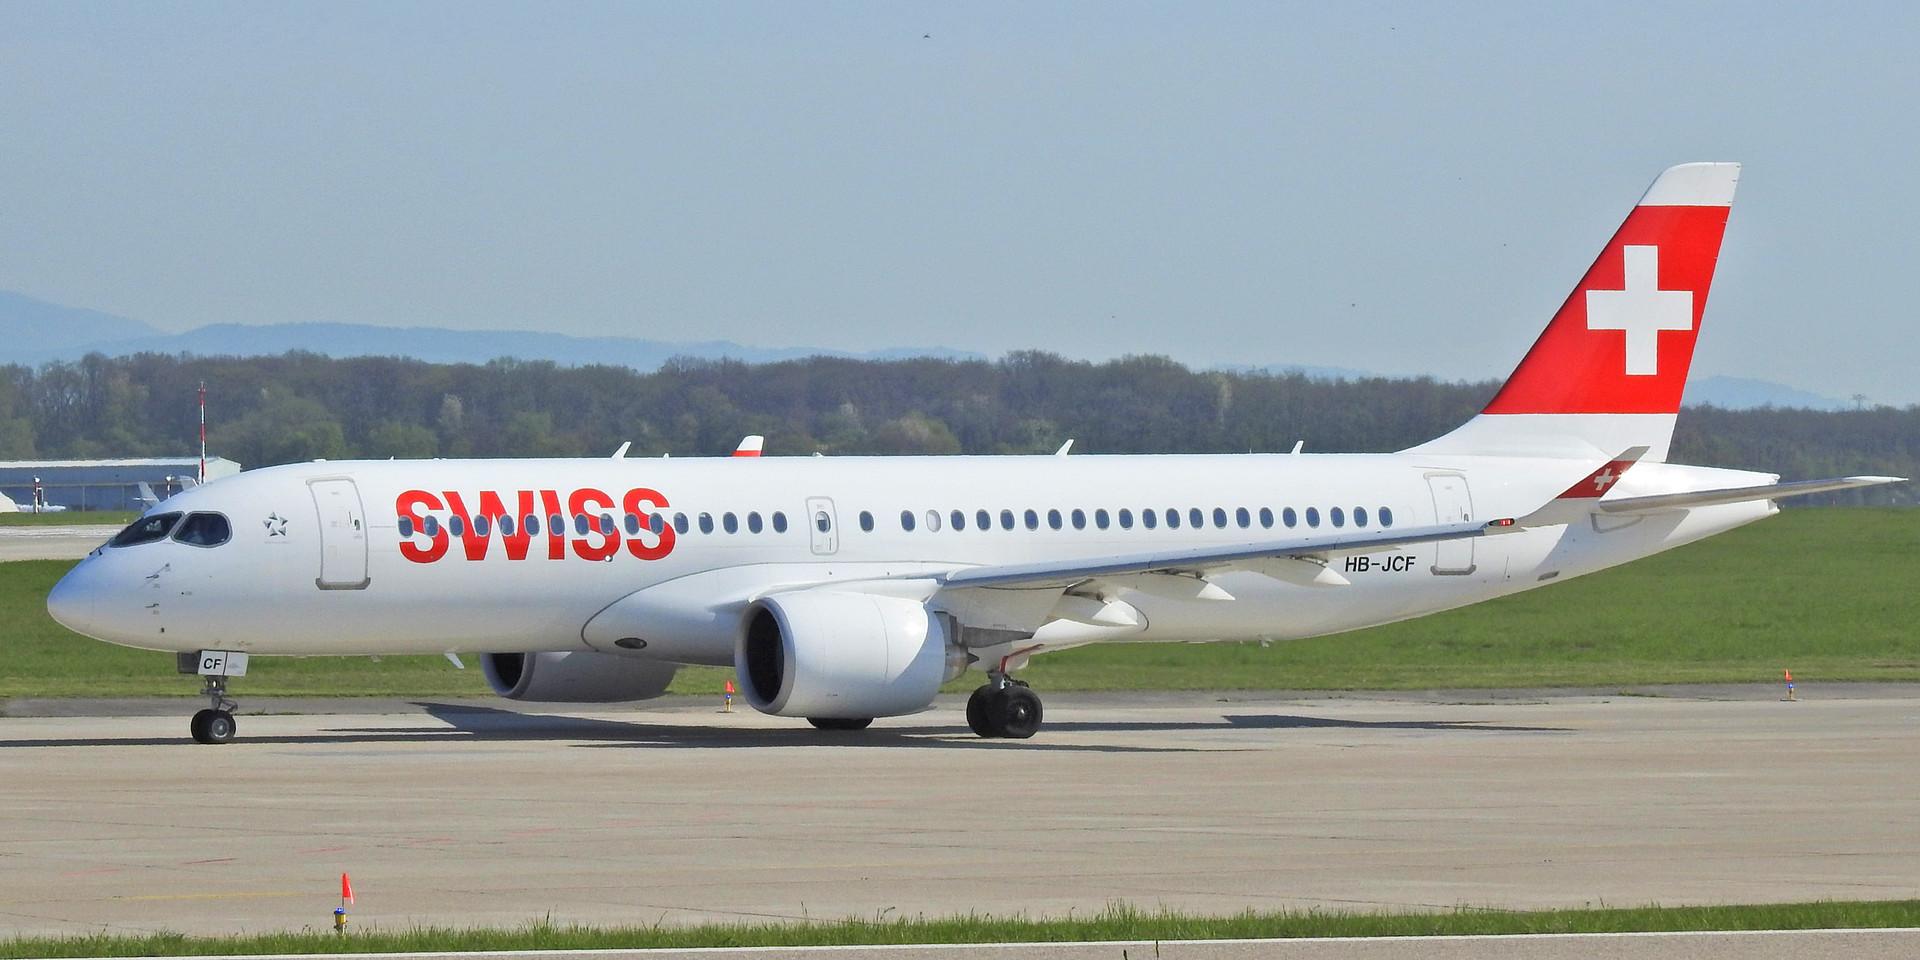 CS3 LX HB-JCF GVA 180420 (2).jpg